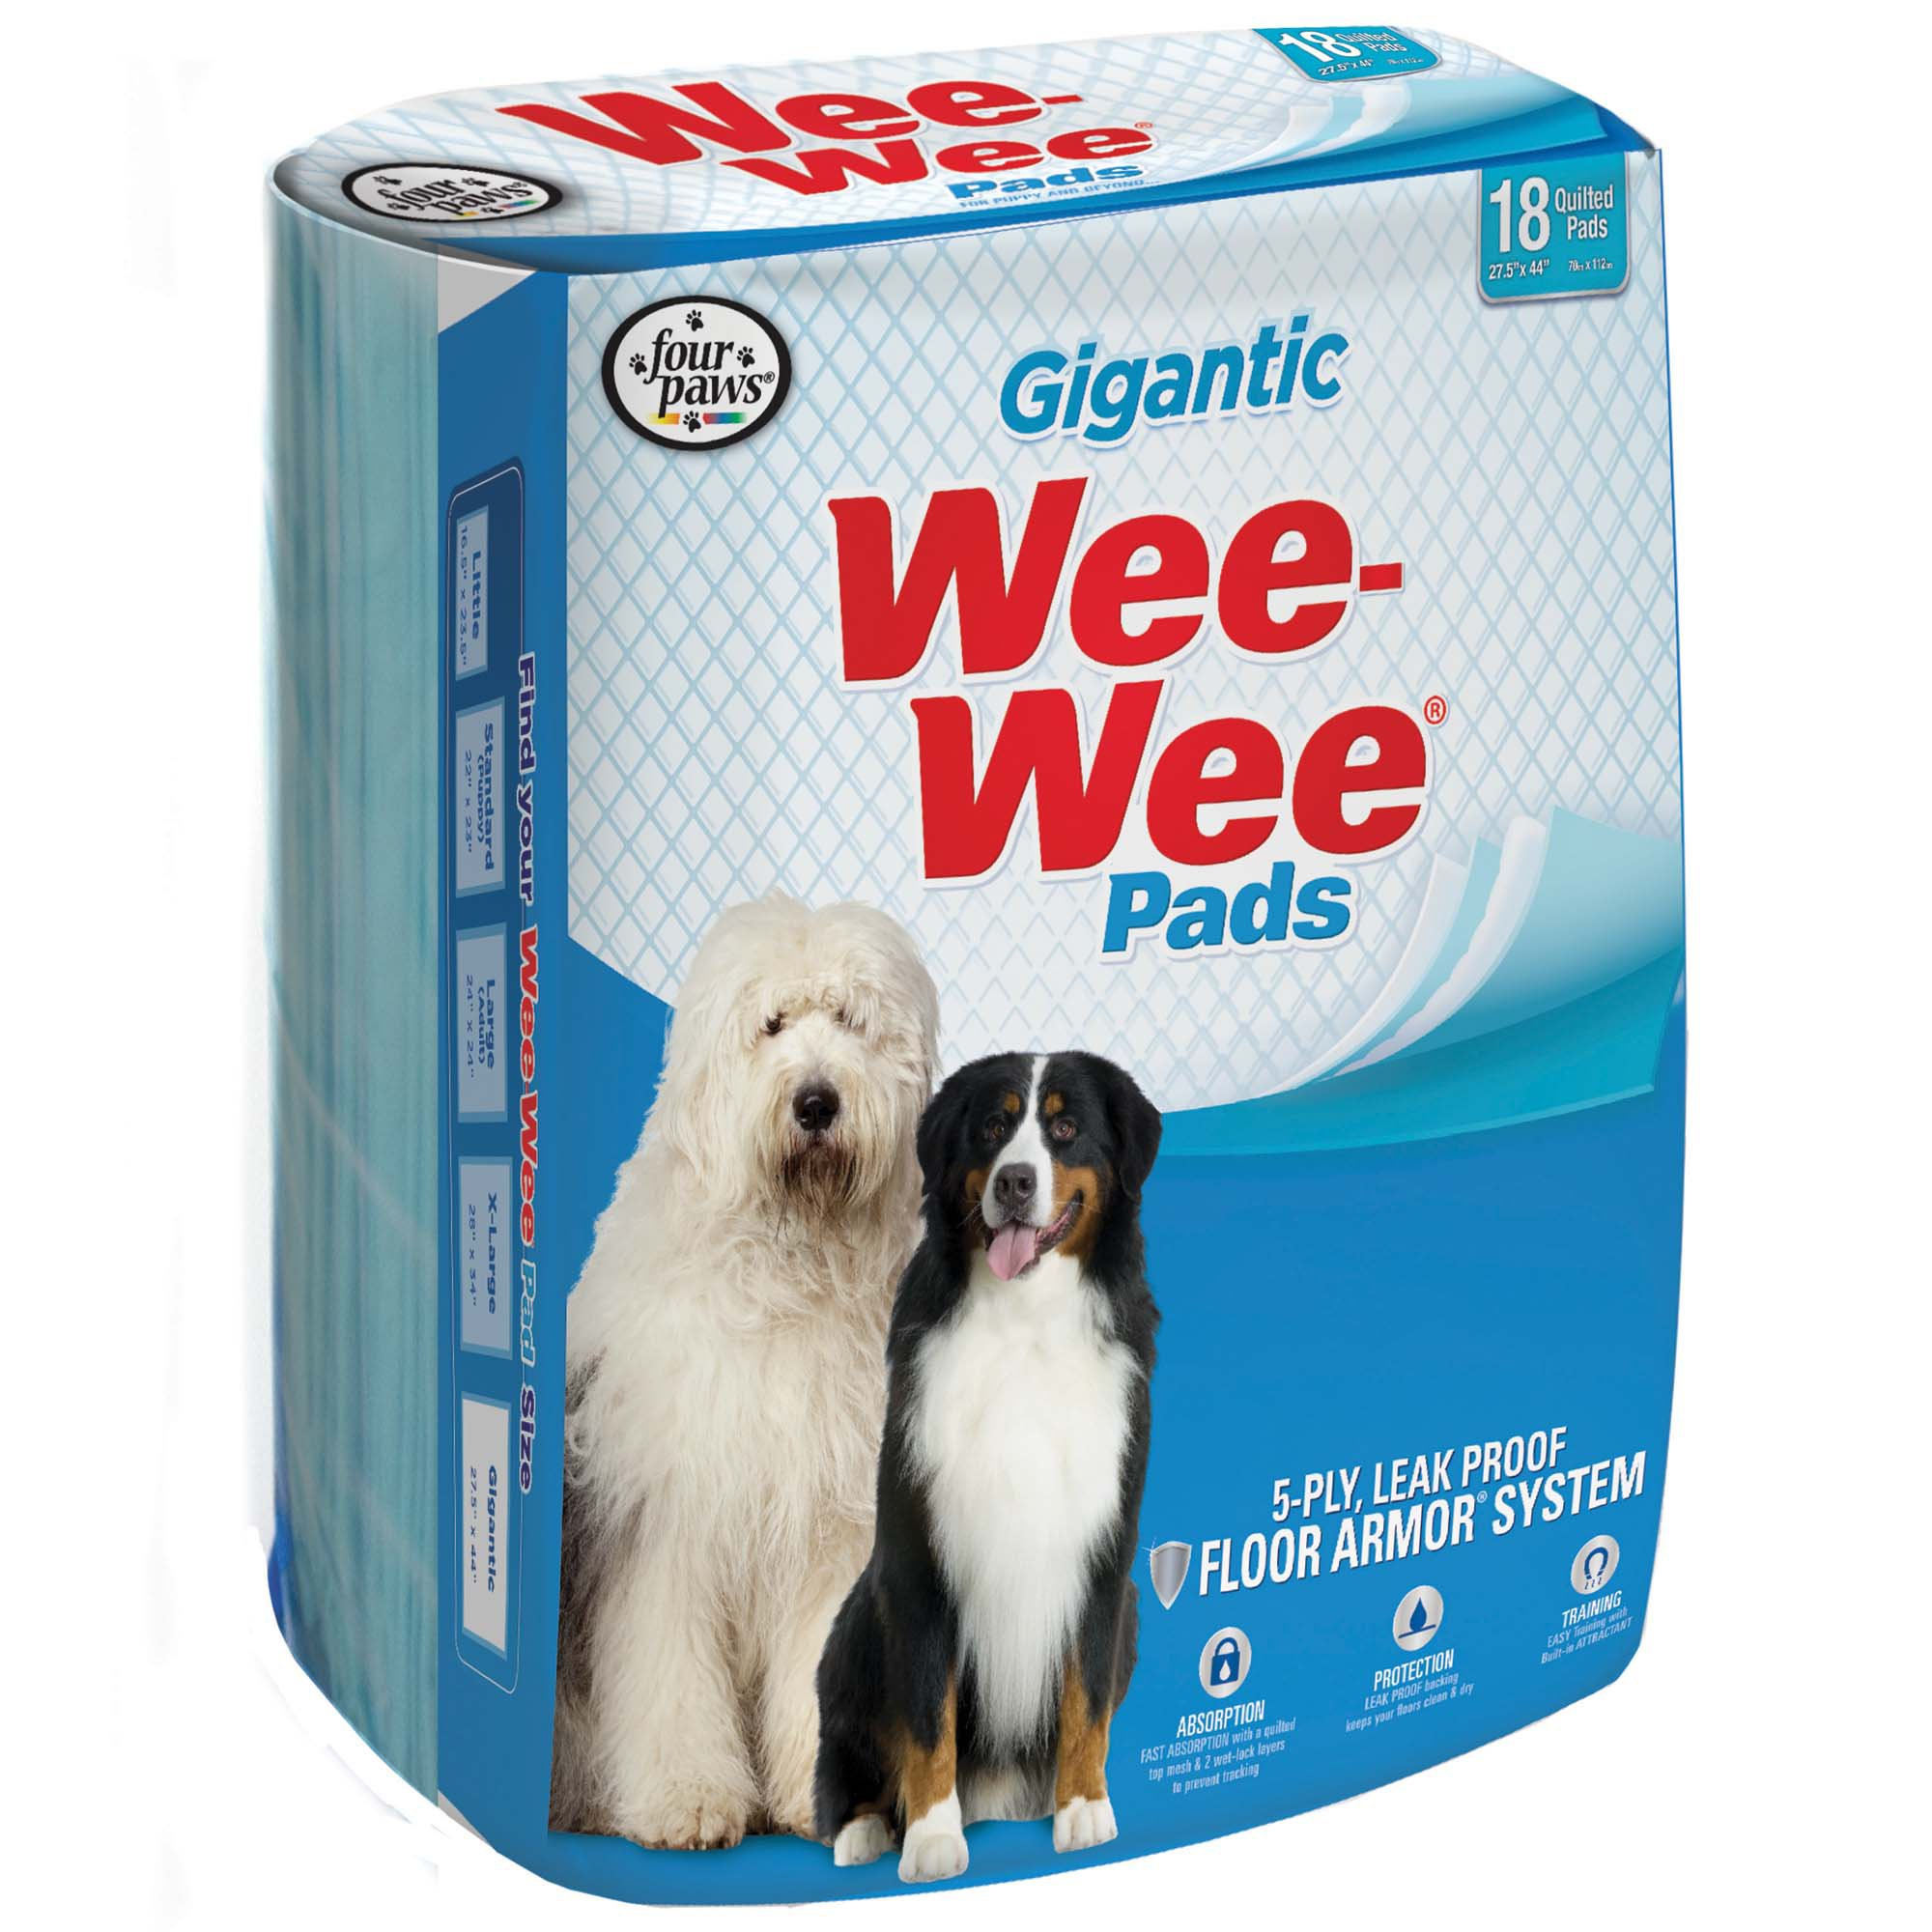 e1778a0e21cd Chucks Alternate Uses Avacare Medical Blog Dog Pads Are Commonly ...